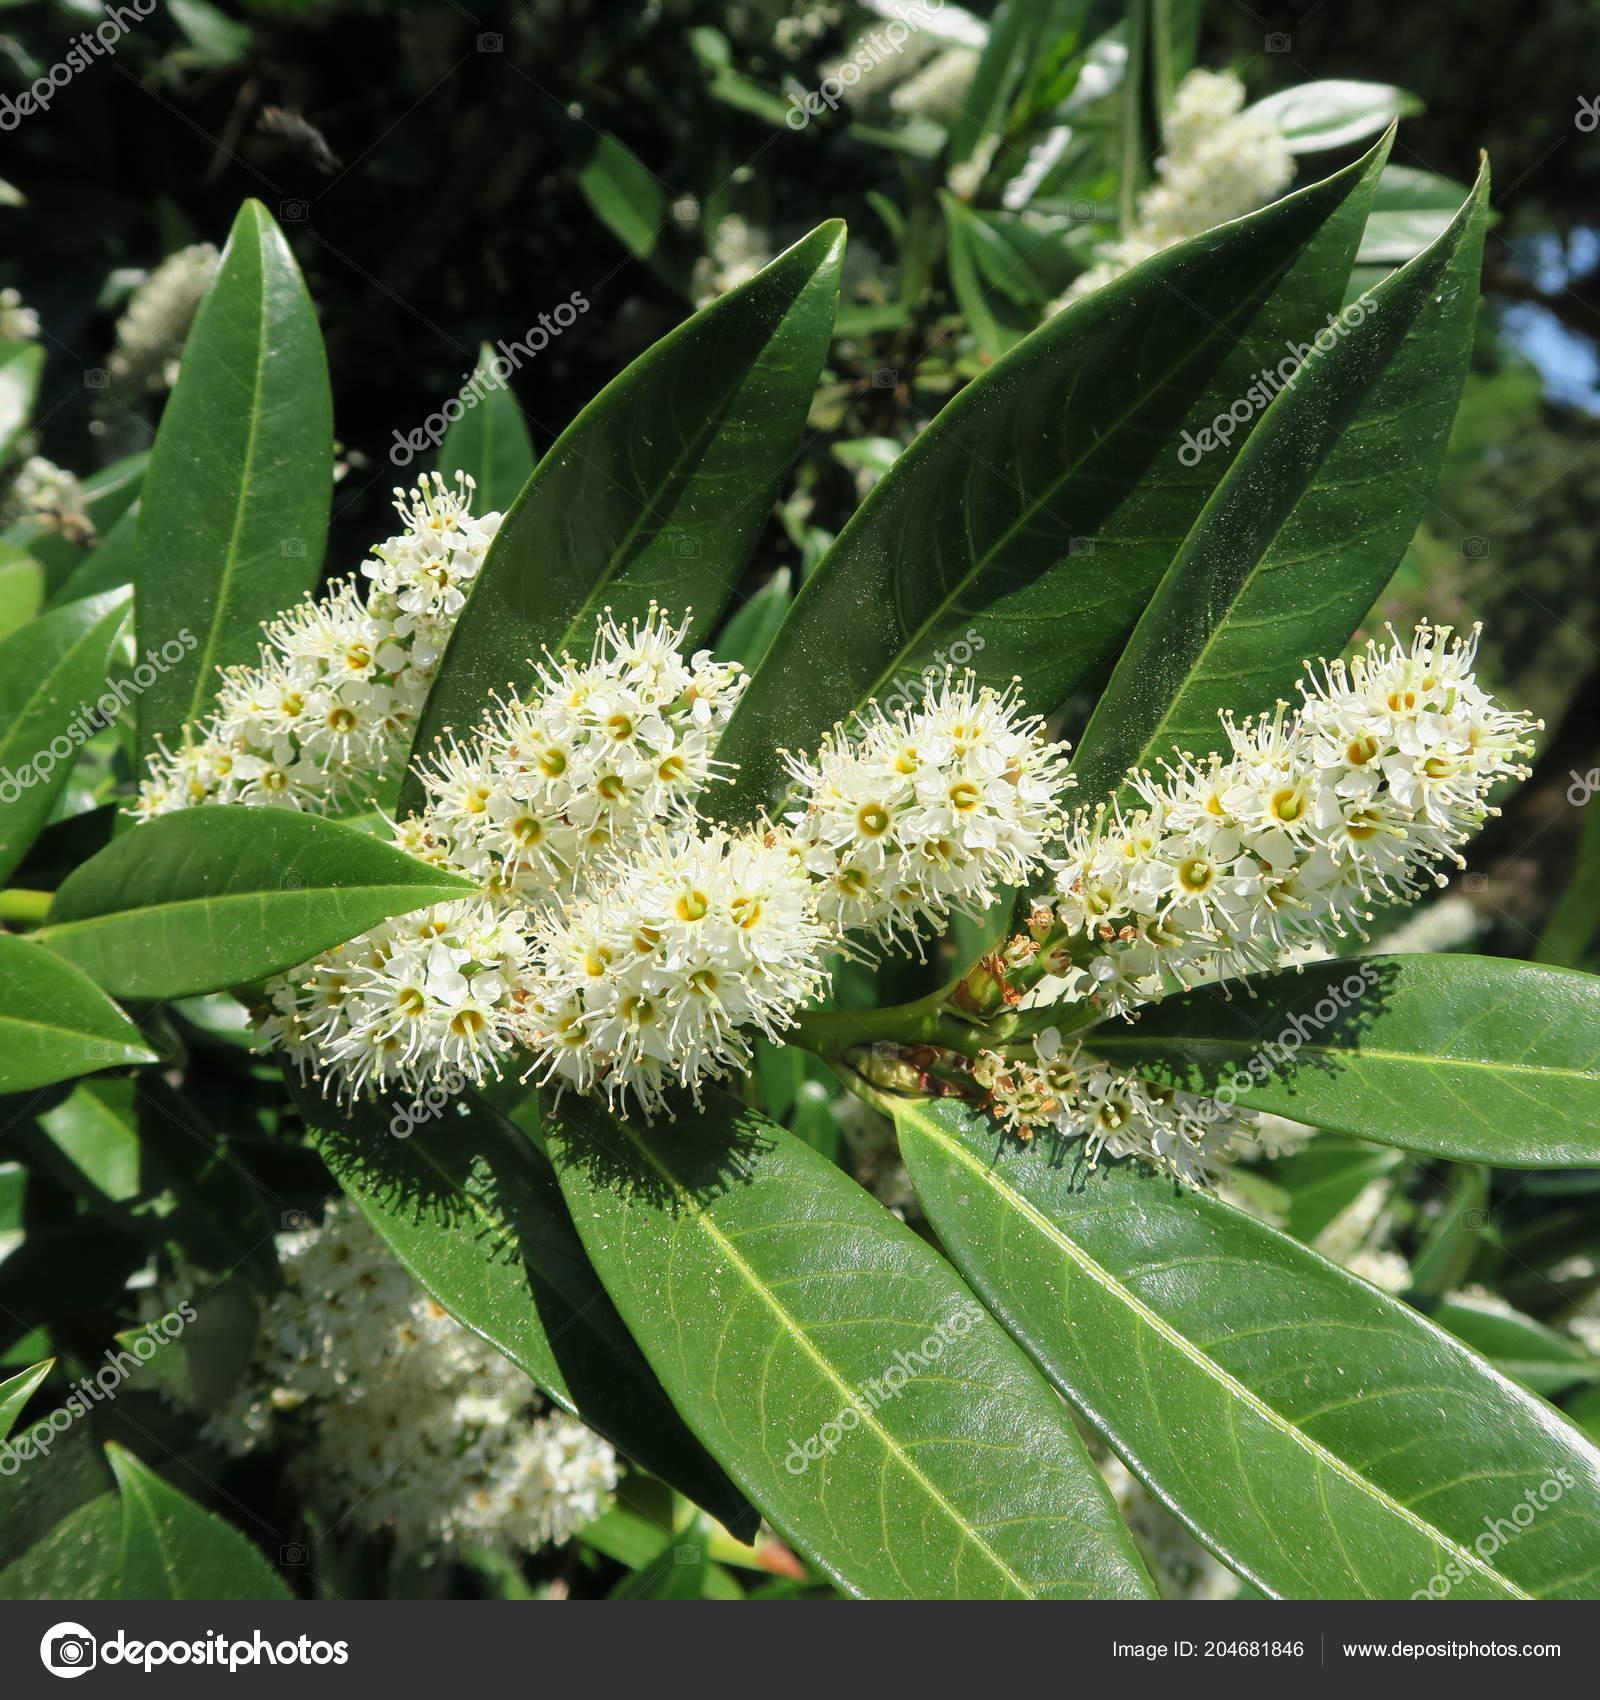 Prunus Laurocerasus Cherry Laurel Green Shrub White Flowers Spring